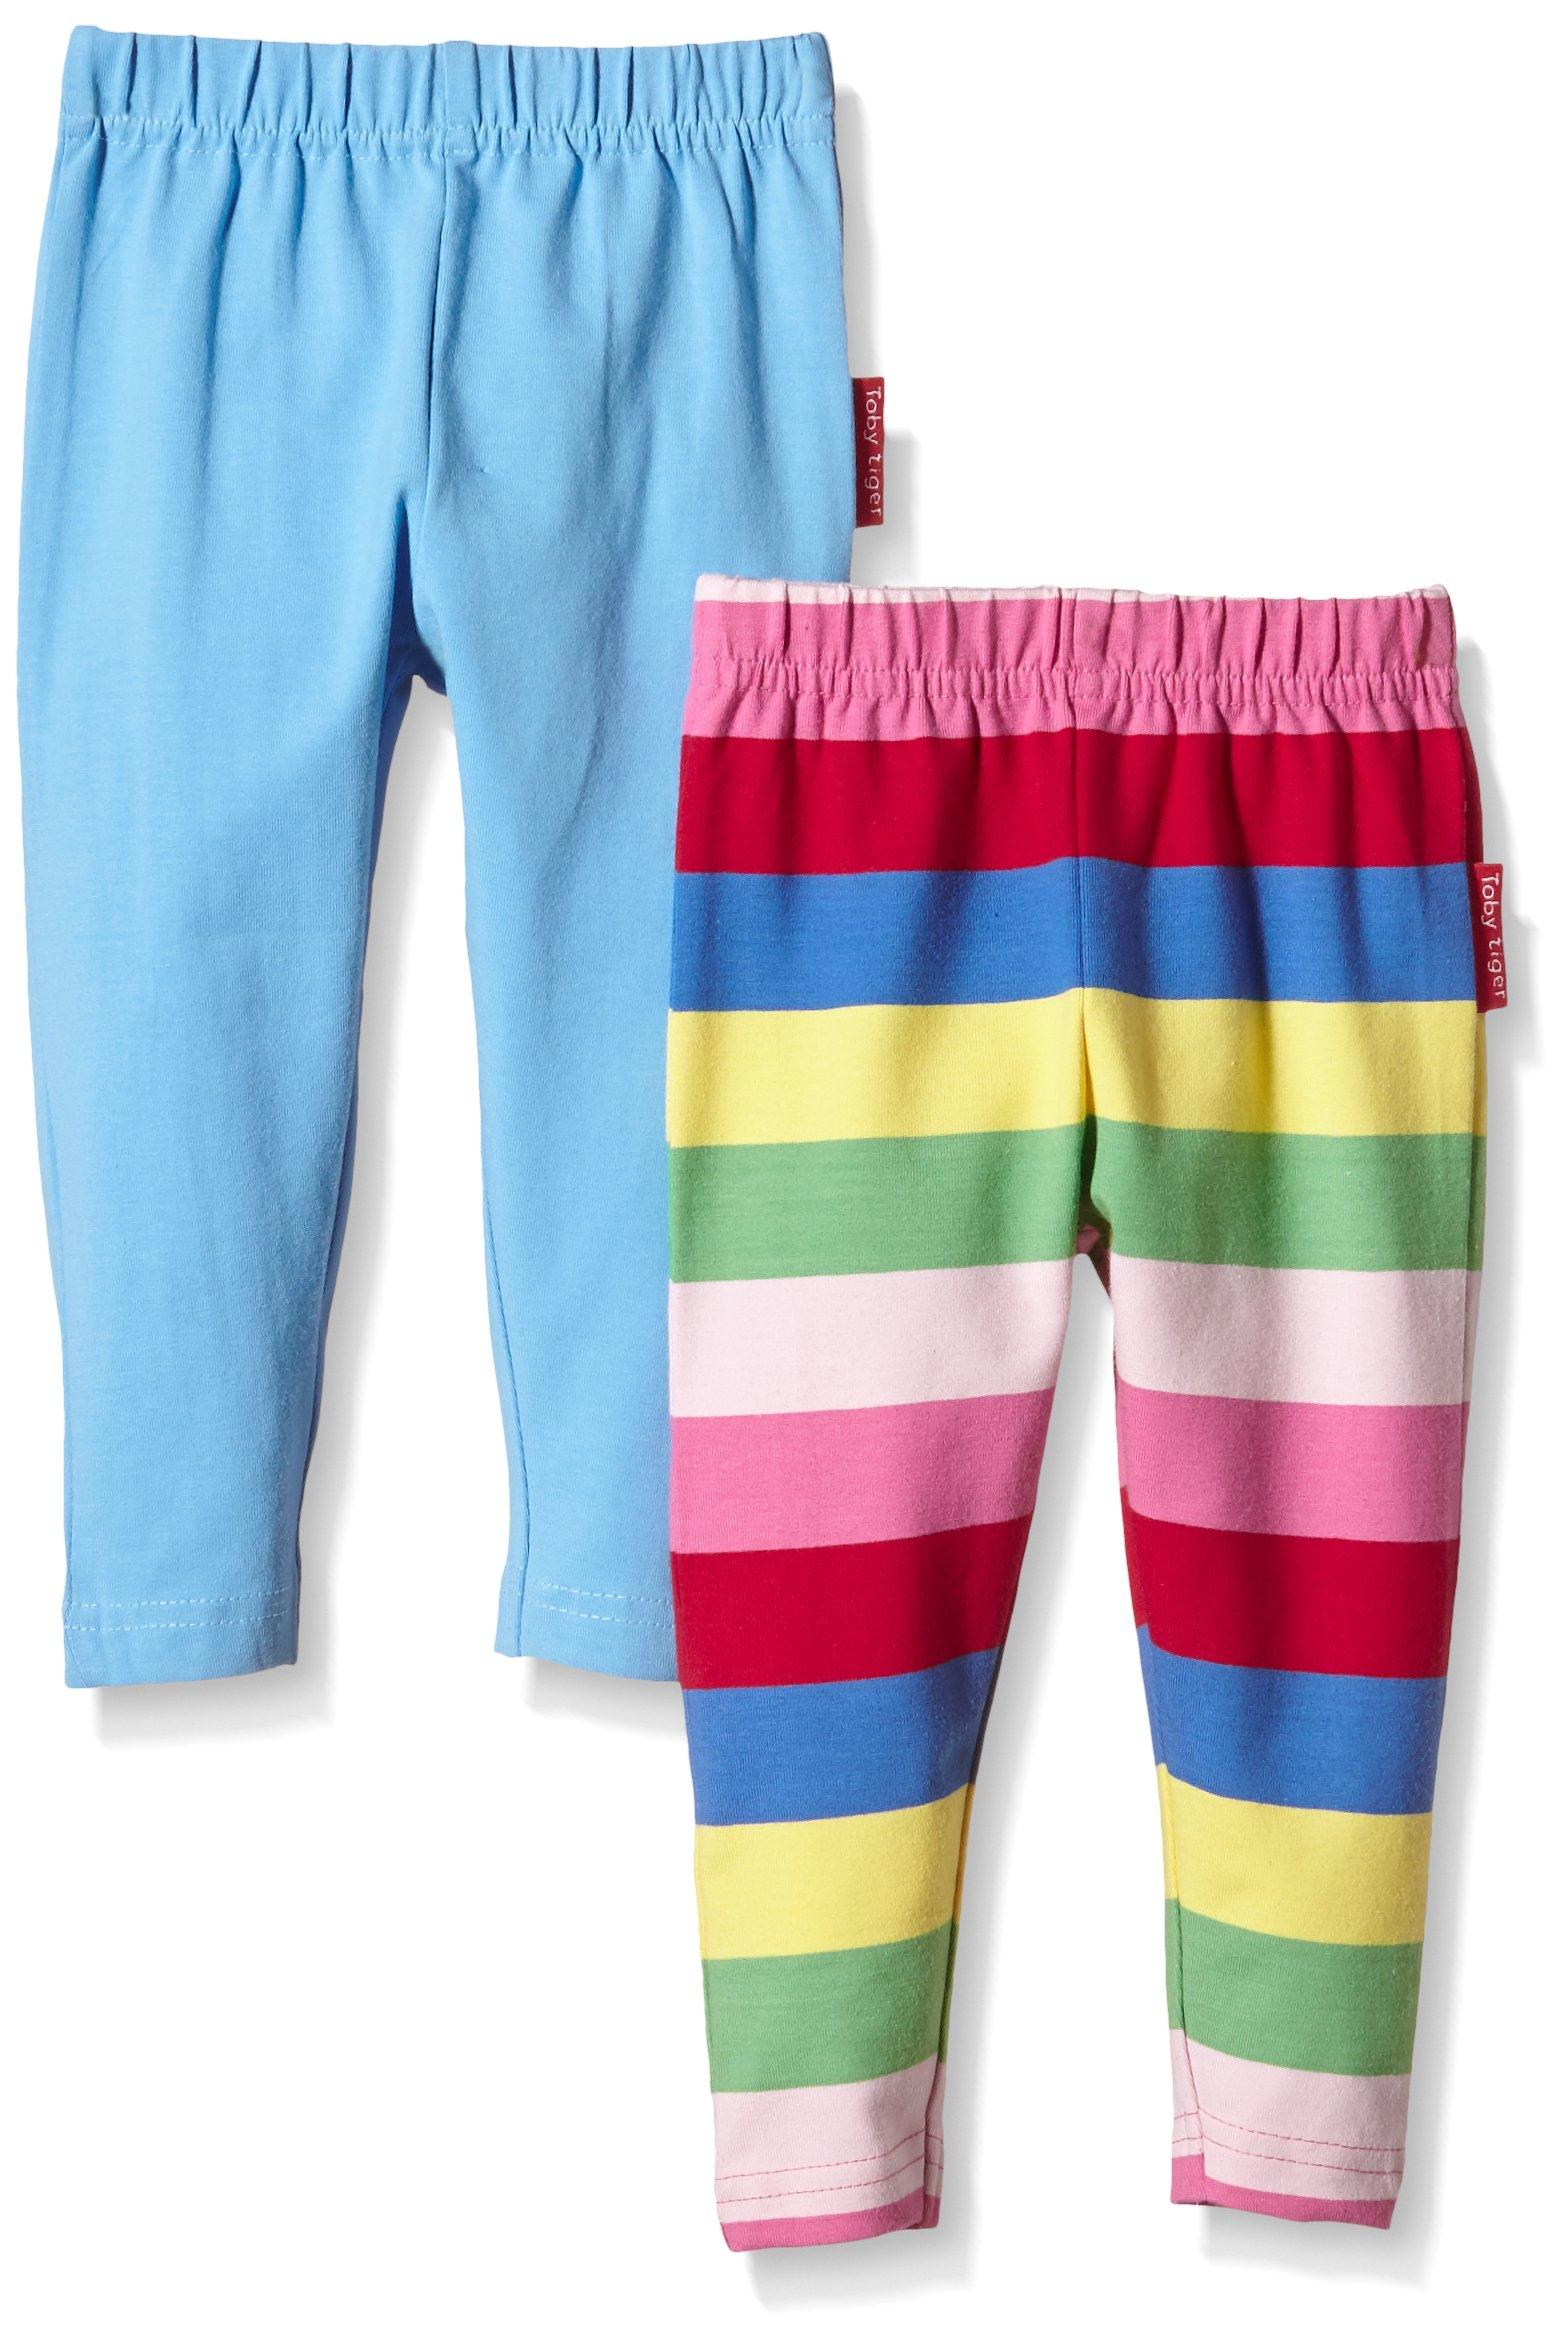 Toby Tiger Girly Stripe Leggings 2 Pack (1-2 Years)